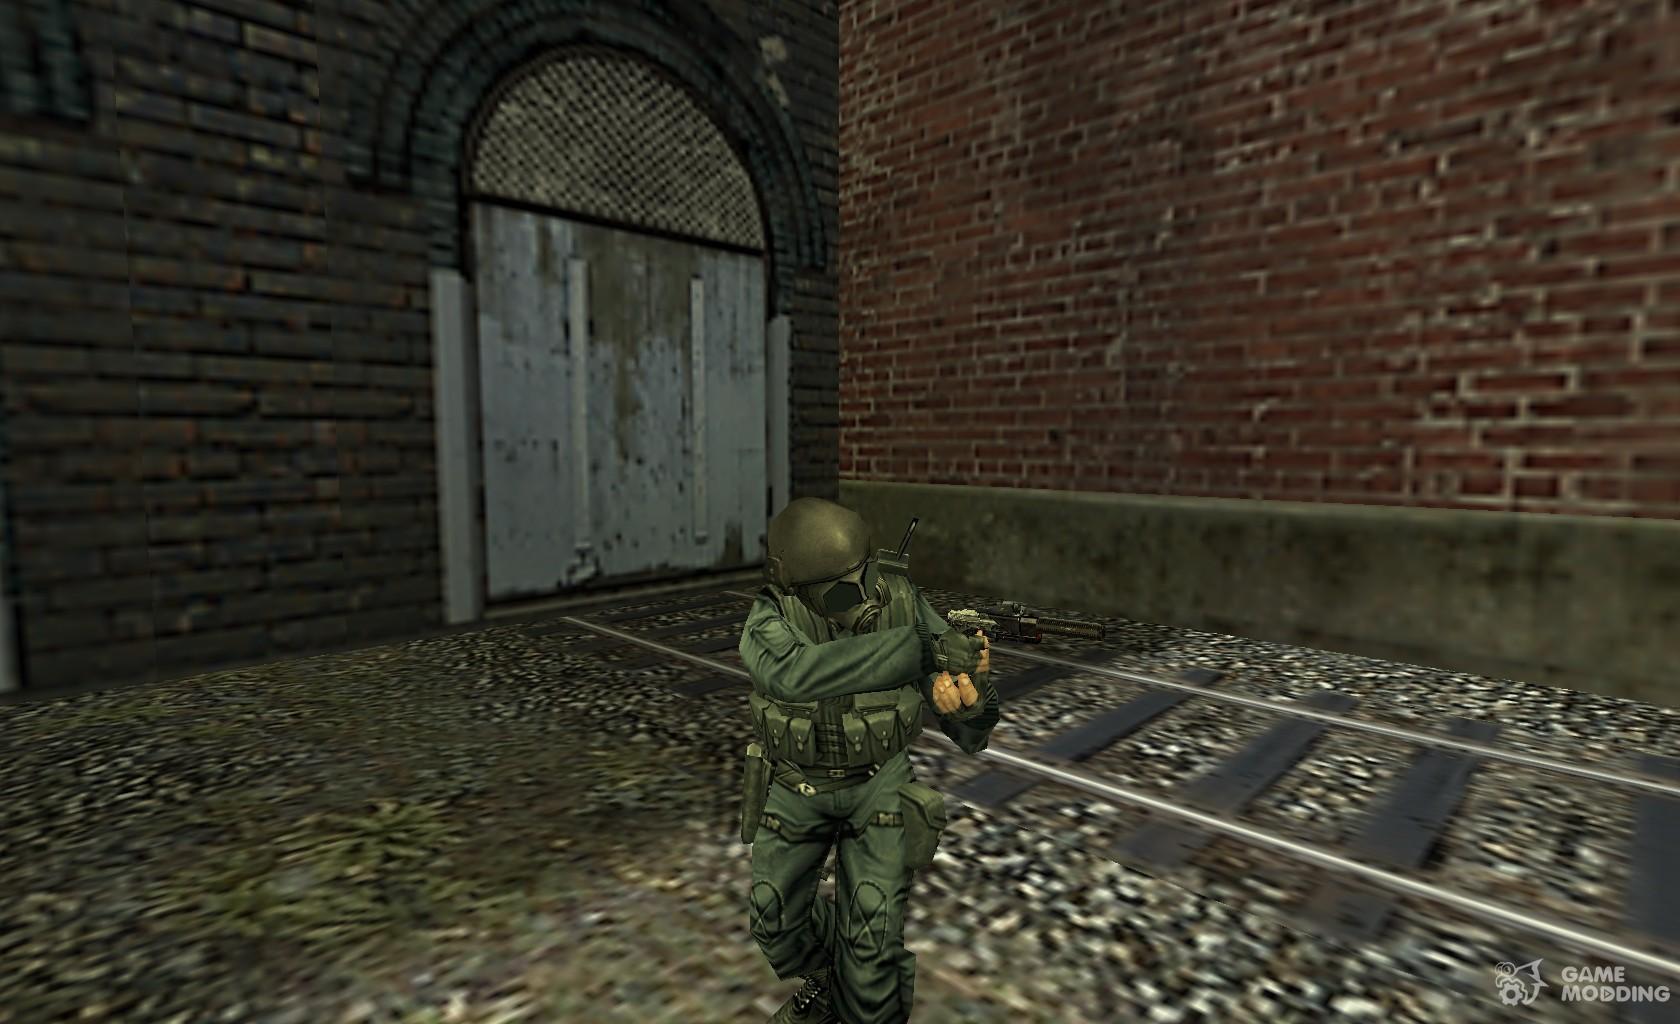 Counter Strike Source Ipad: H&K Usp For Counter-Strike 1.6